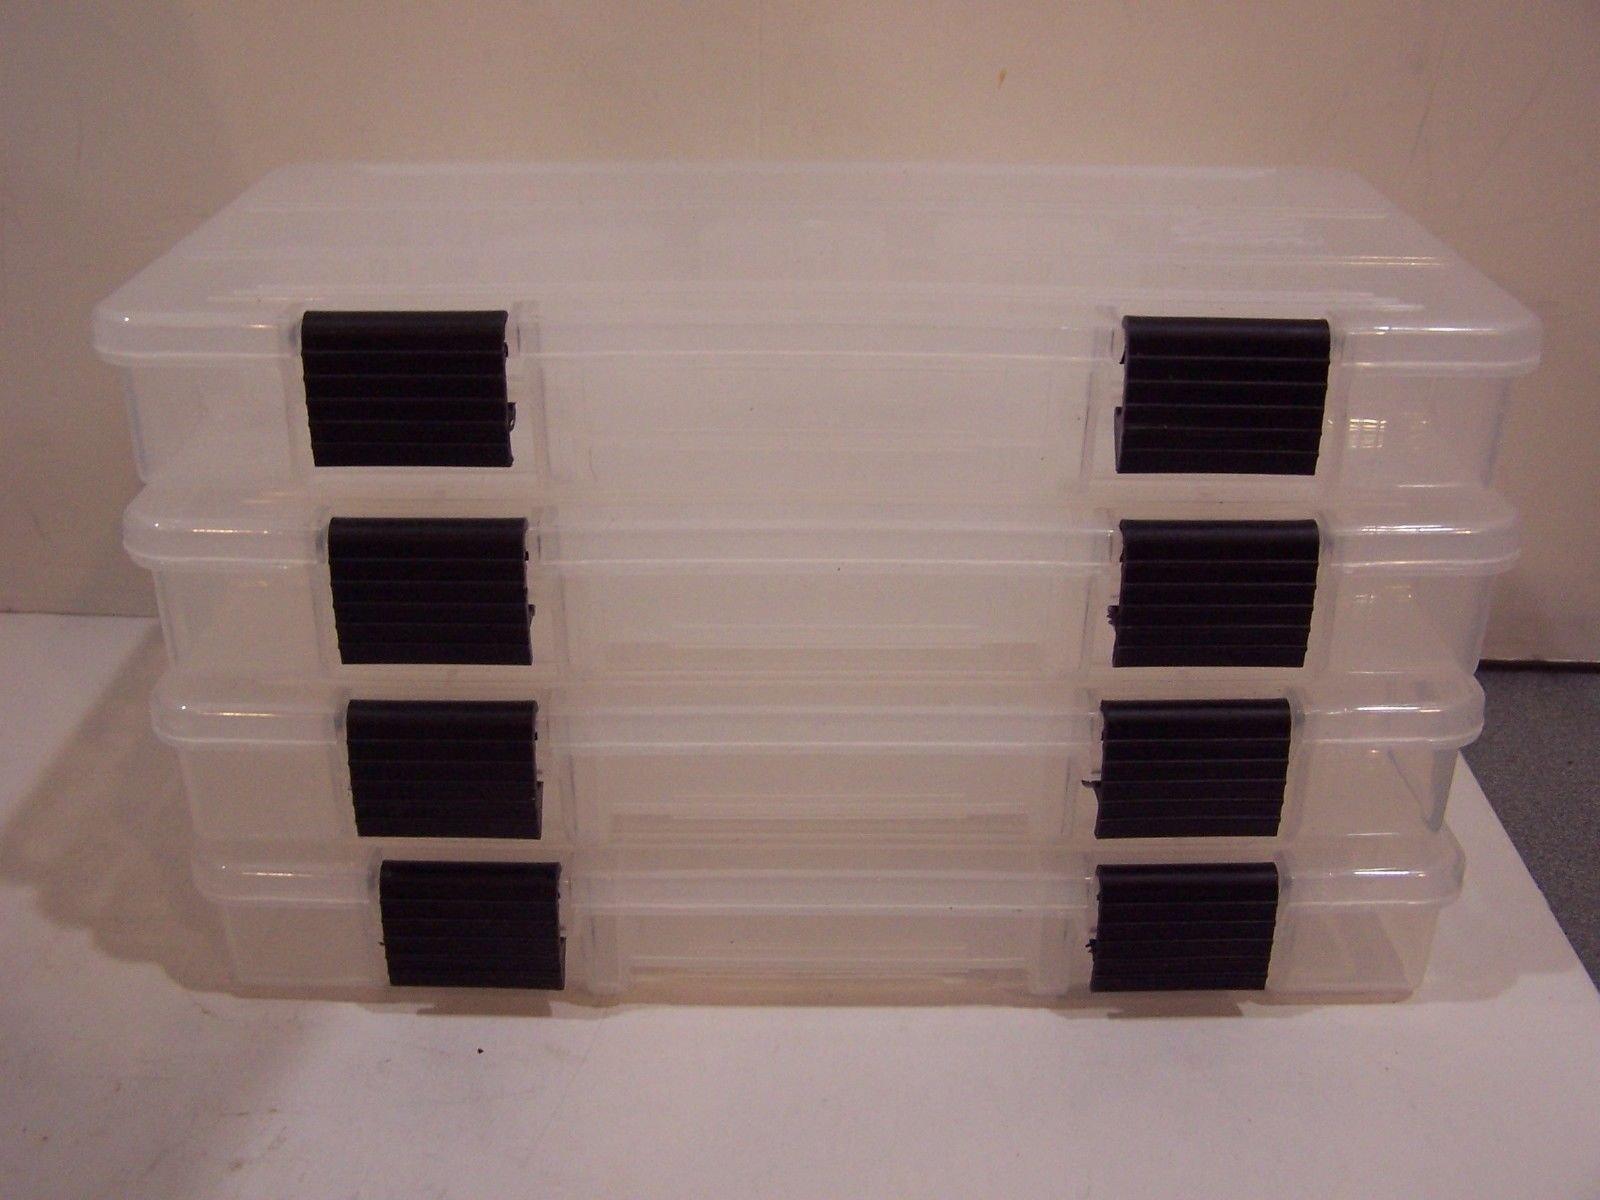 Plano Molding Company 2-3500 Prolatch Stowaway Utility Box (4-Pack) (Black, 2-3500) by Plano